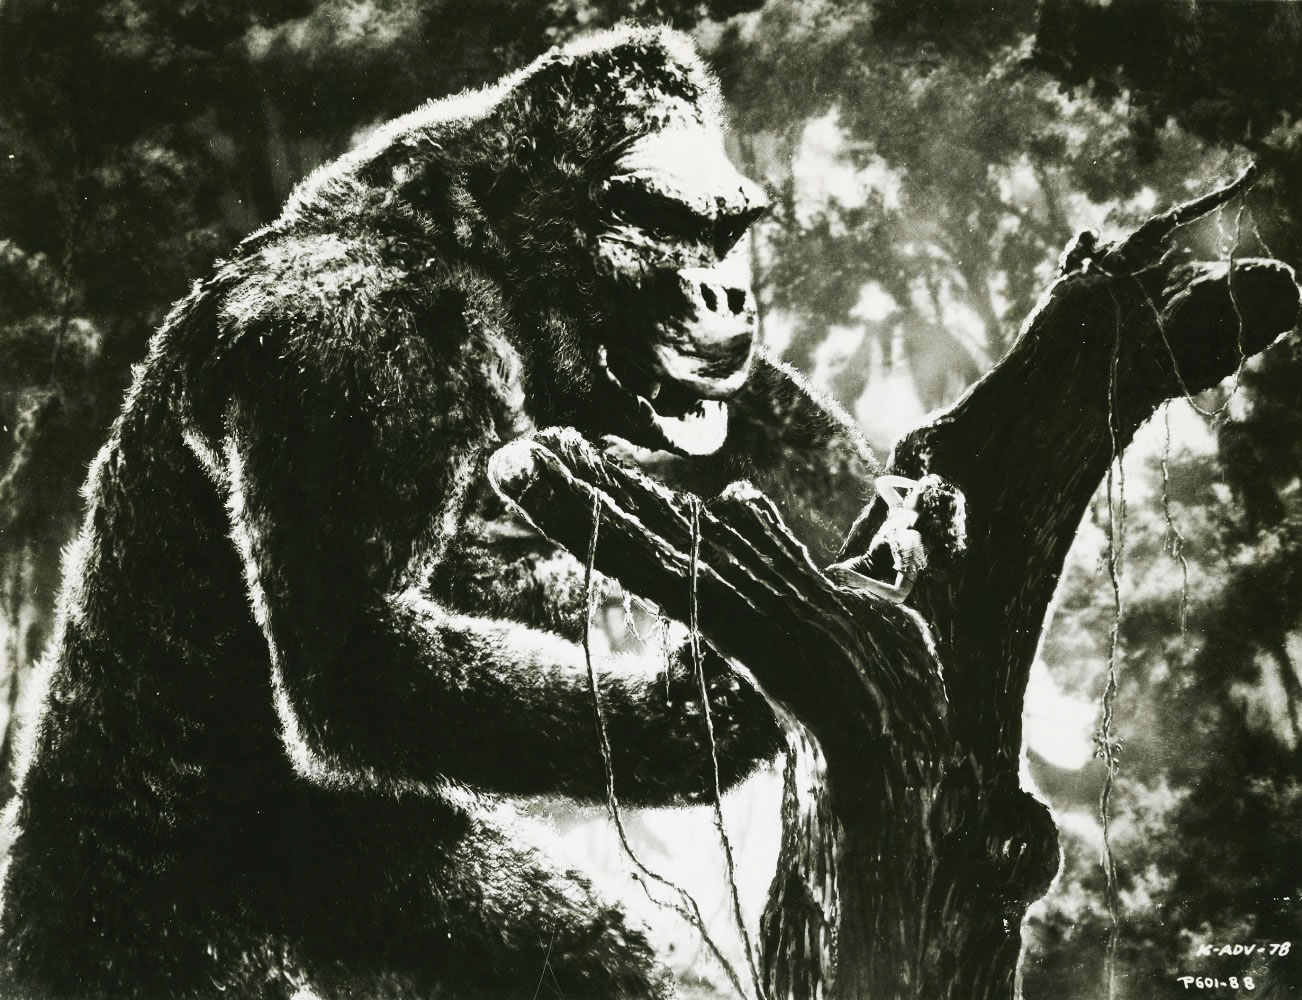 Fay Wray dans King Kong de Merian Caldwell Cooper et Ernest Beaumont Schoedsack (1933)